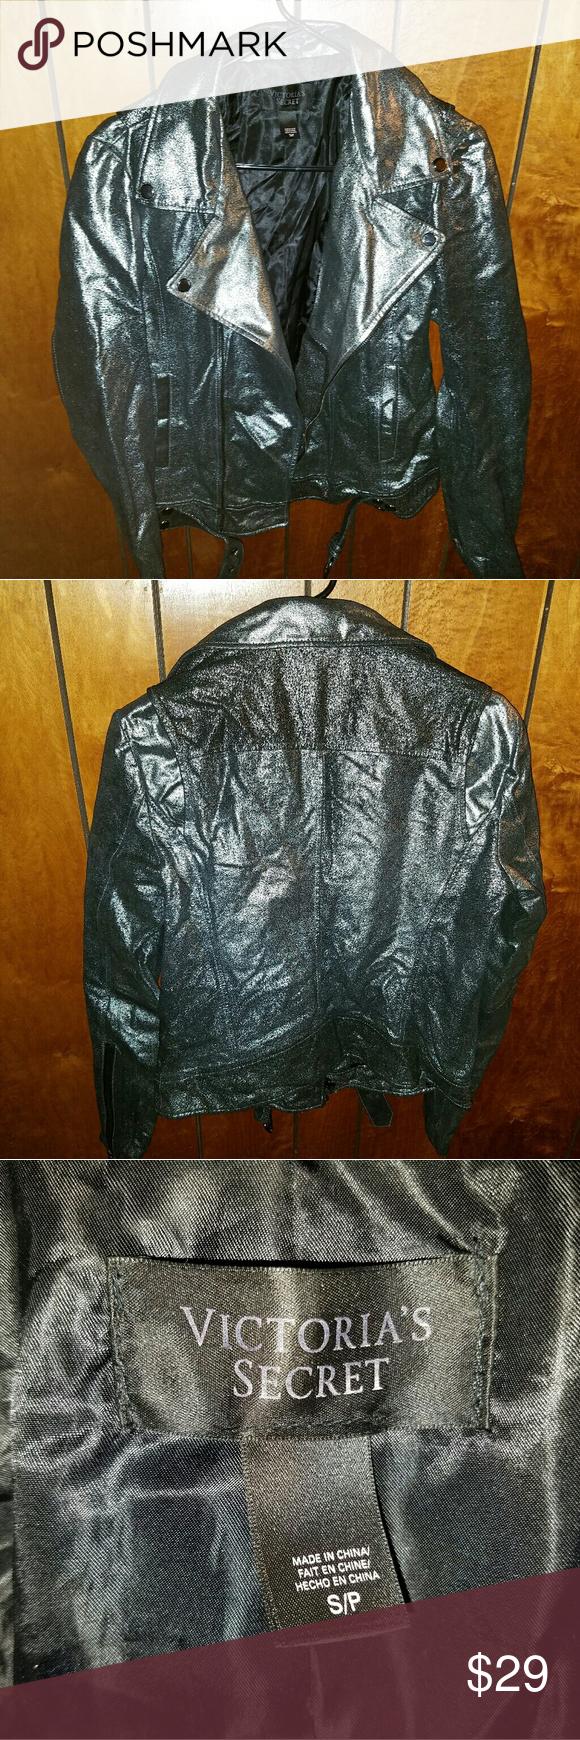 Victoria secret jacket Victoria secret jacket Victoria's Secret Jackets & Coats